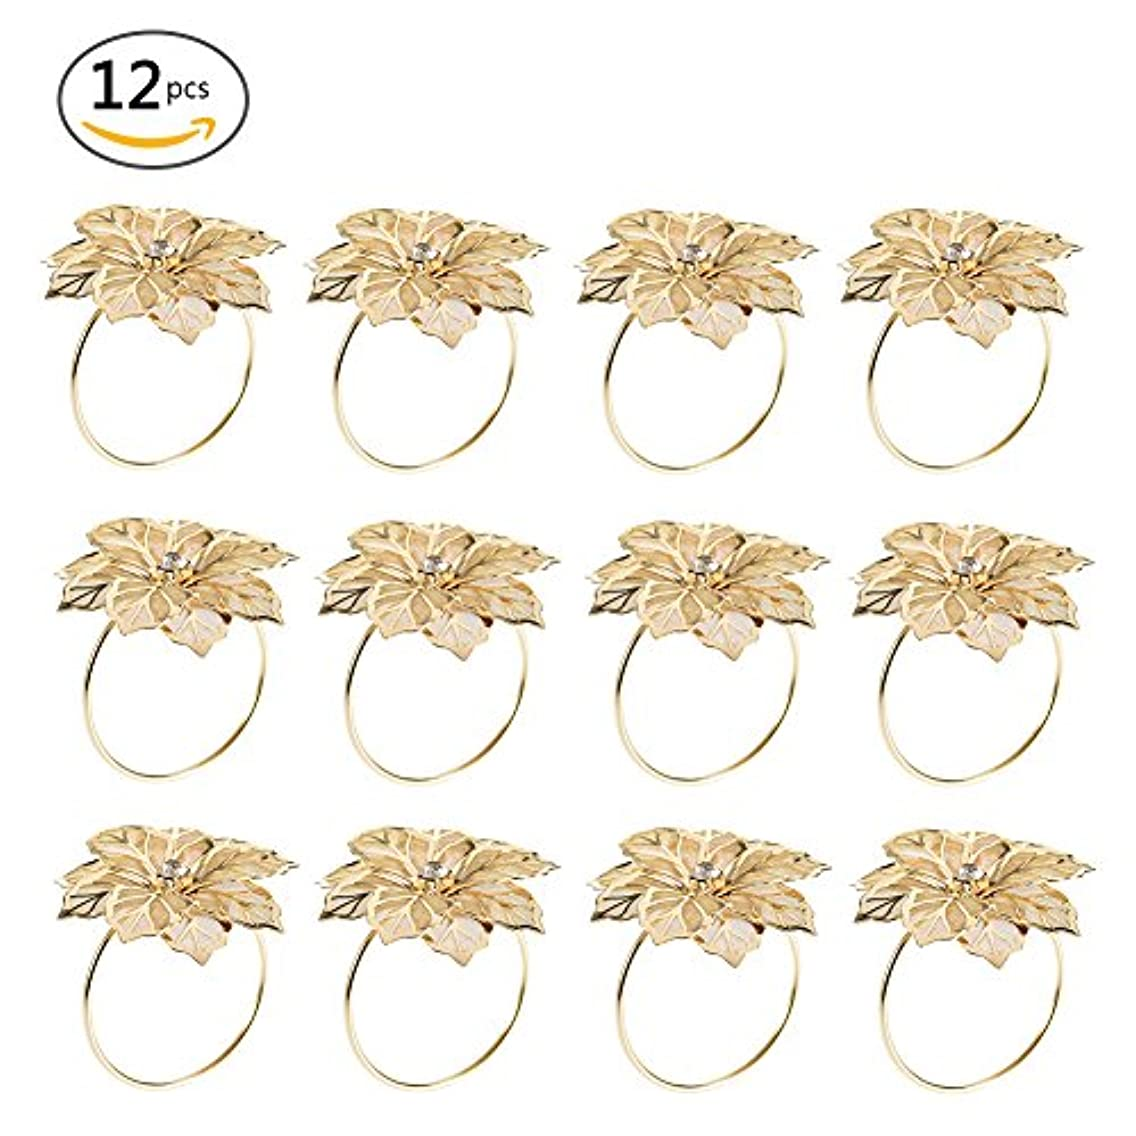 SHZONS Napkin Rings, 12pcs Wedding Cutout Floral Alloy Napkin Rings